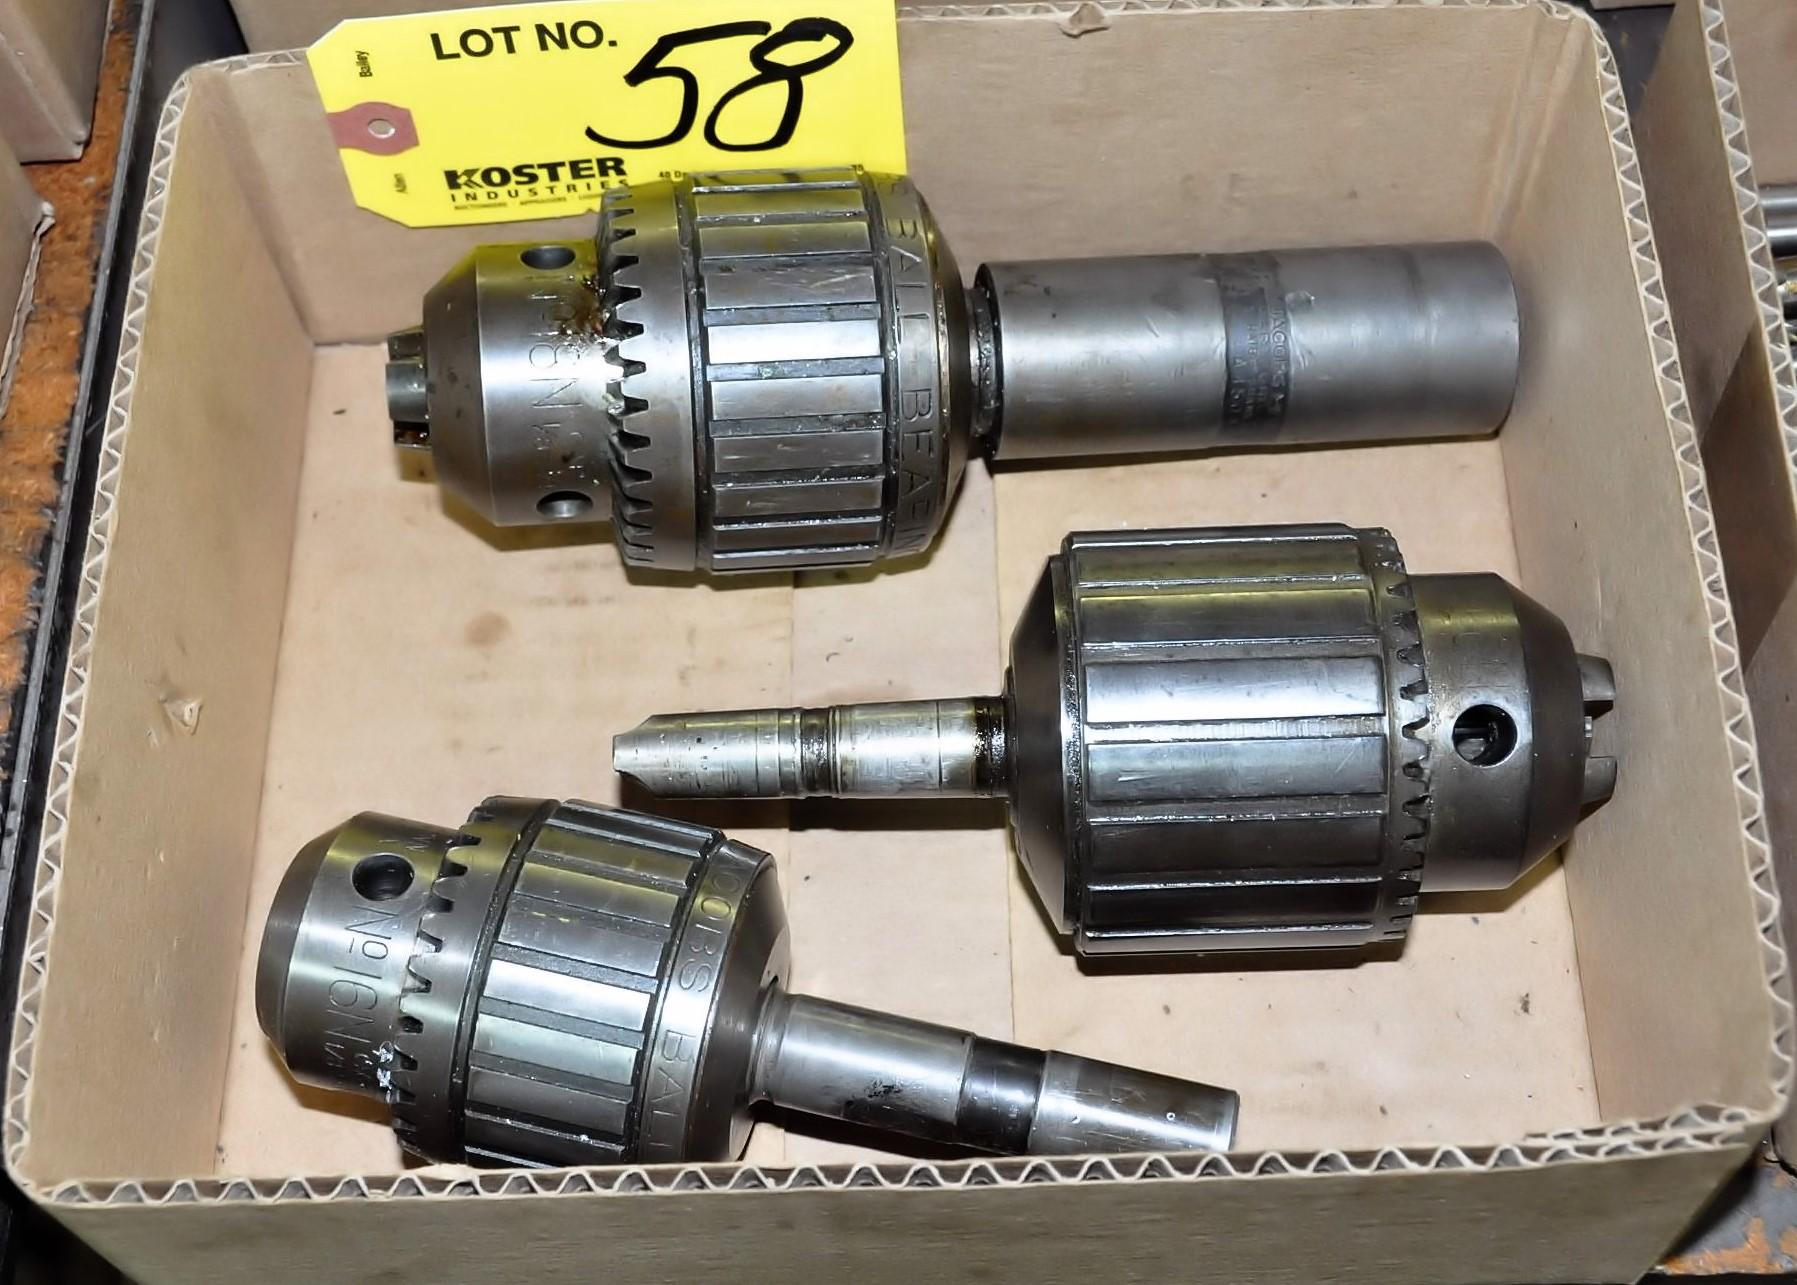 Lot 58 - (1) JACOBS NO. 16N, (1) NO. 18 AND (1) NO. 18N CHUCKS IN (1) BOX